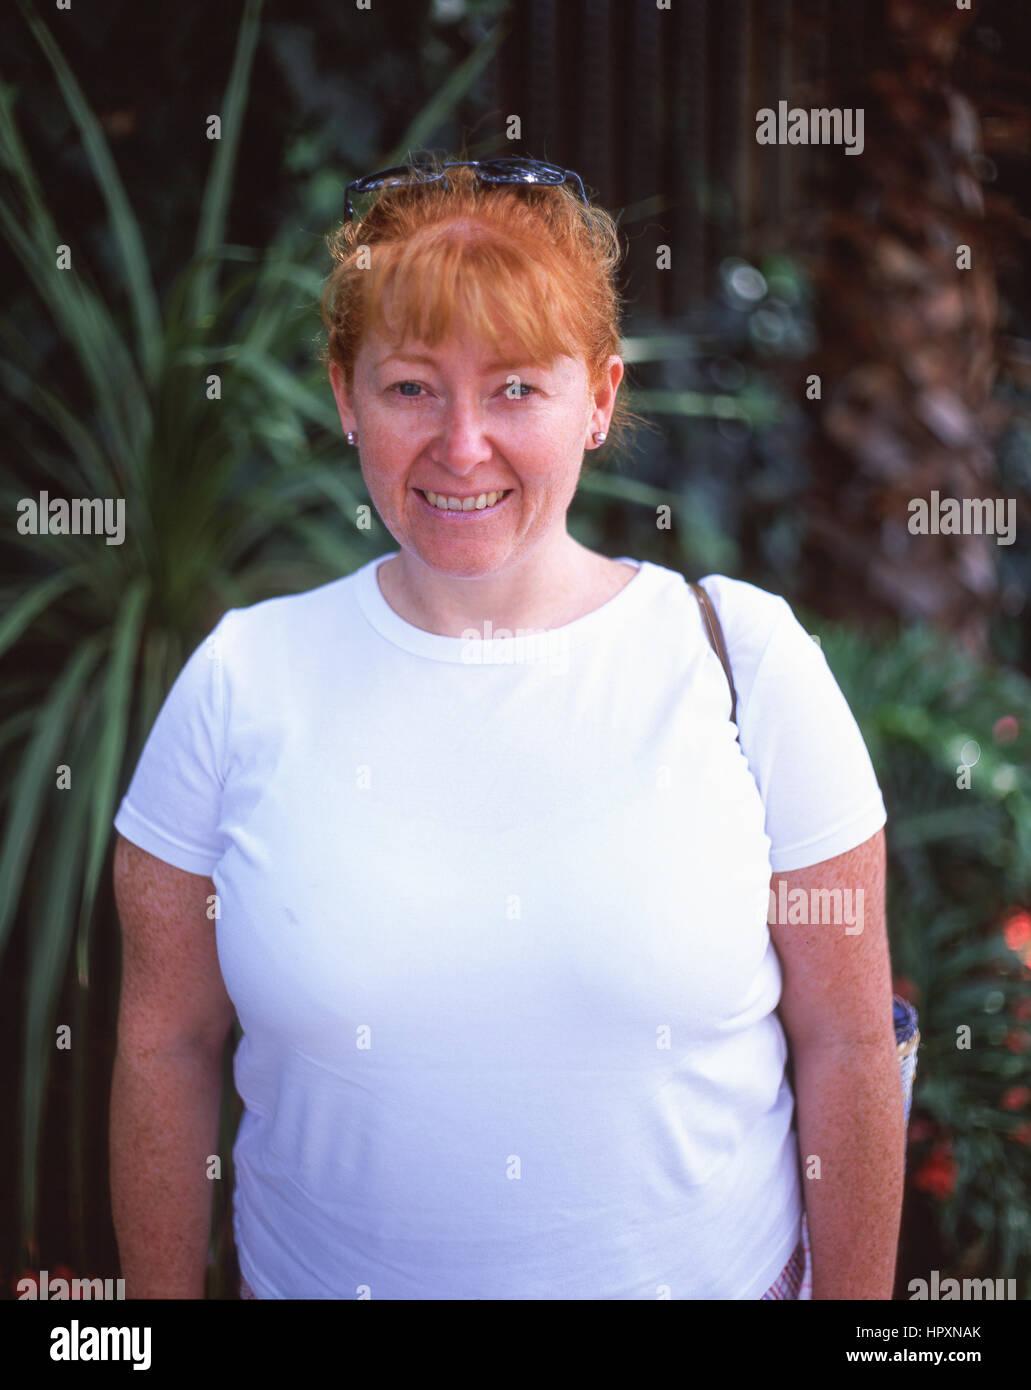 Junge rothaarige Frau (30), Surrey, England, Vereinigtes Königreich Stockbild